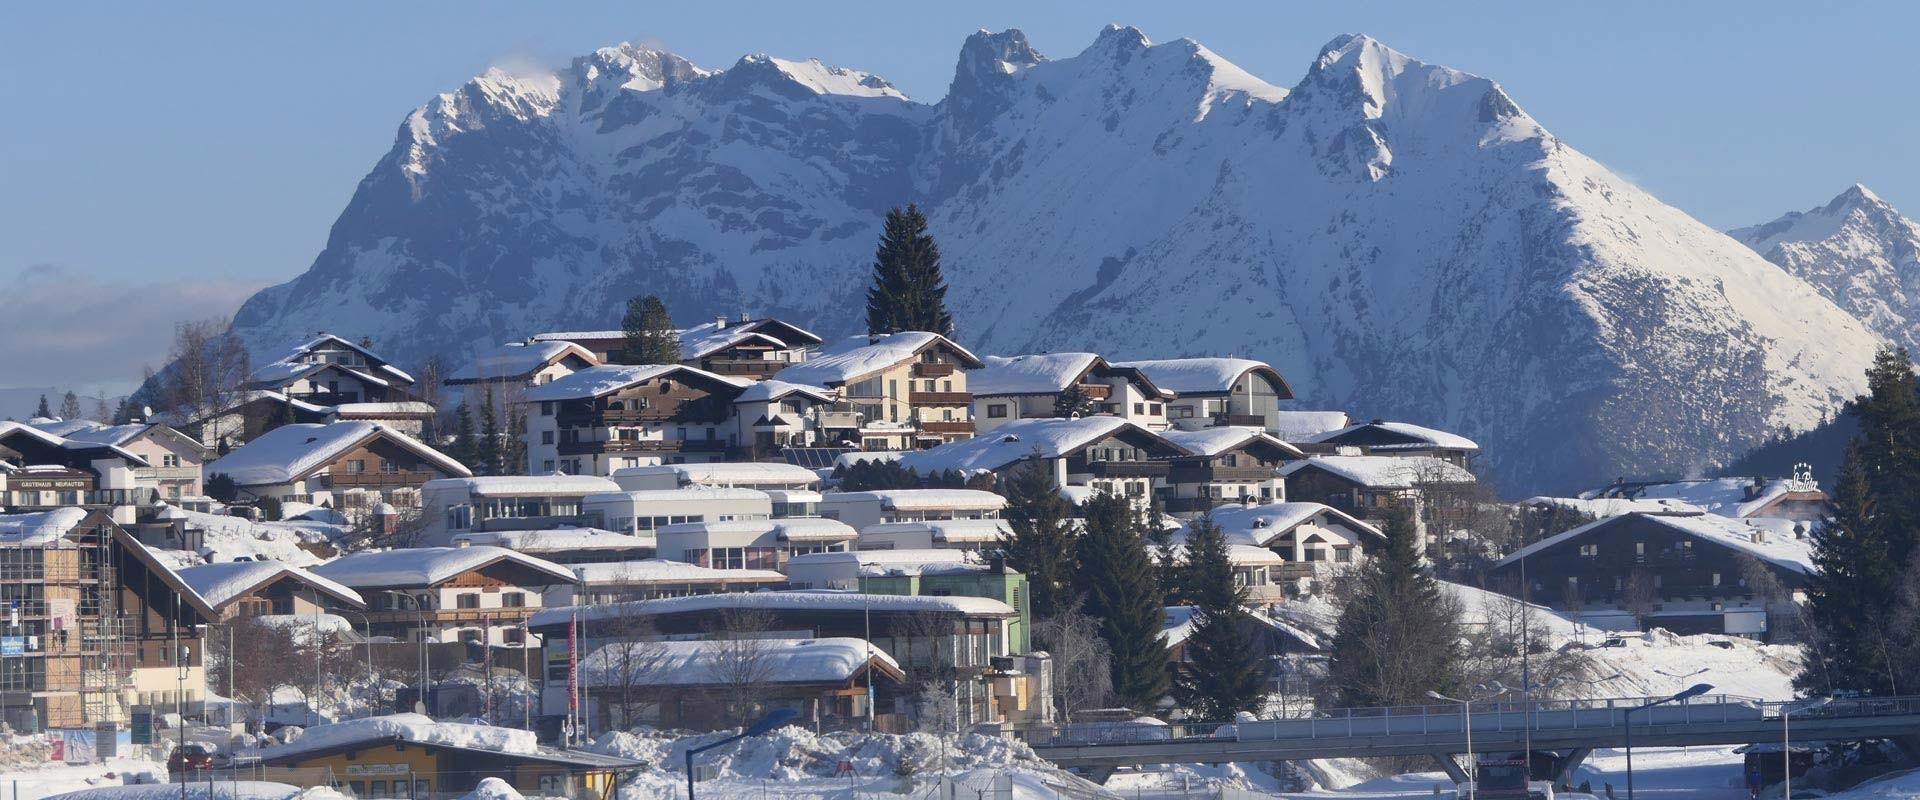 News & Views Portal About XC Skiing